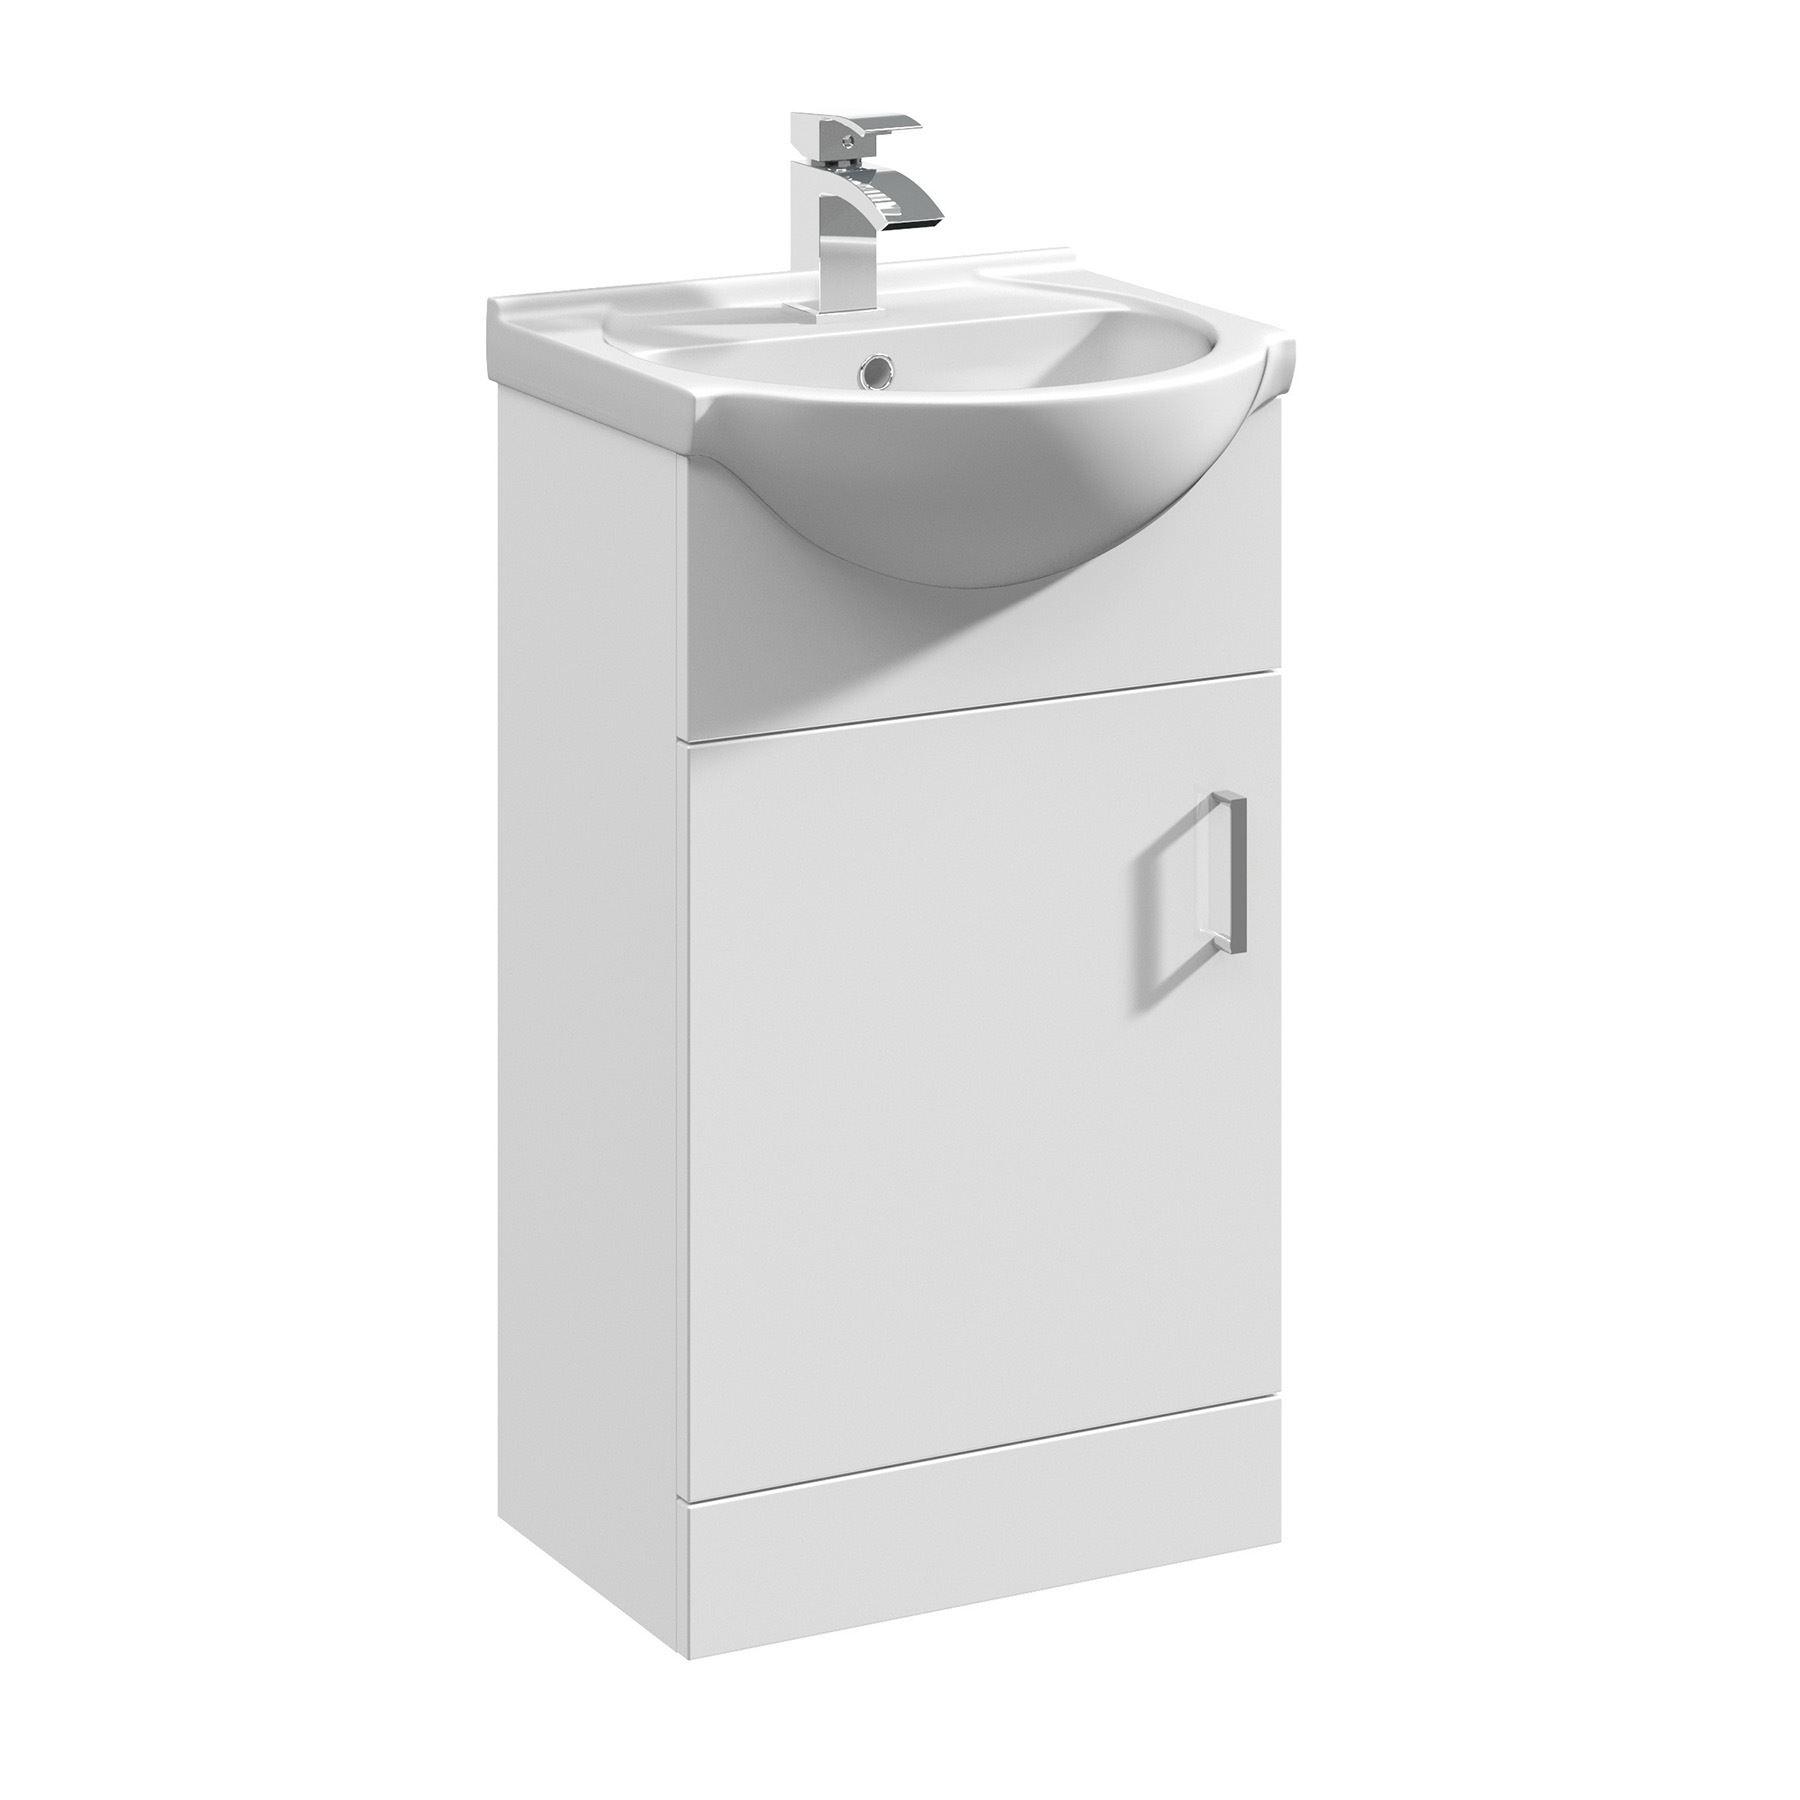 ... -Bathroom-Vanity-Unit-Cloakroom-Cabinet-Cupboard-Ceramic-Sink-Basin